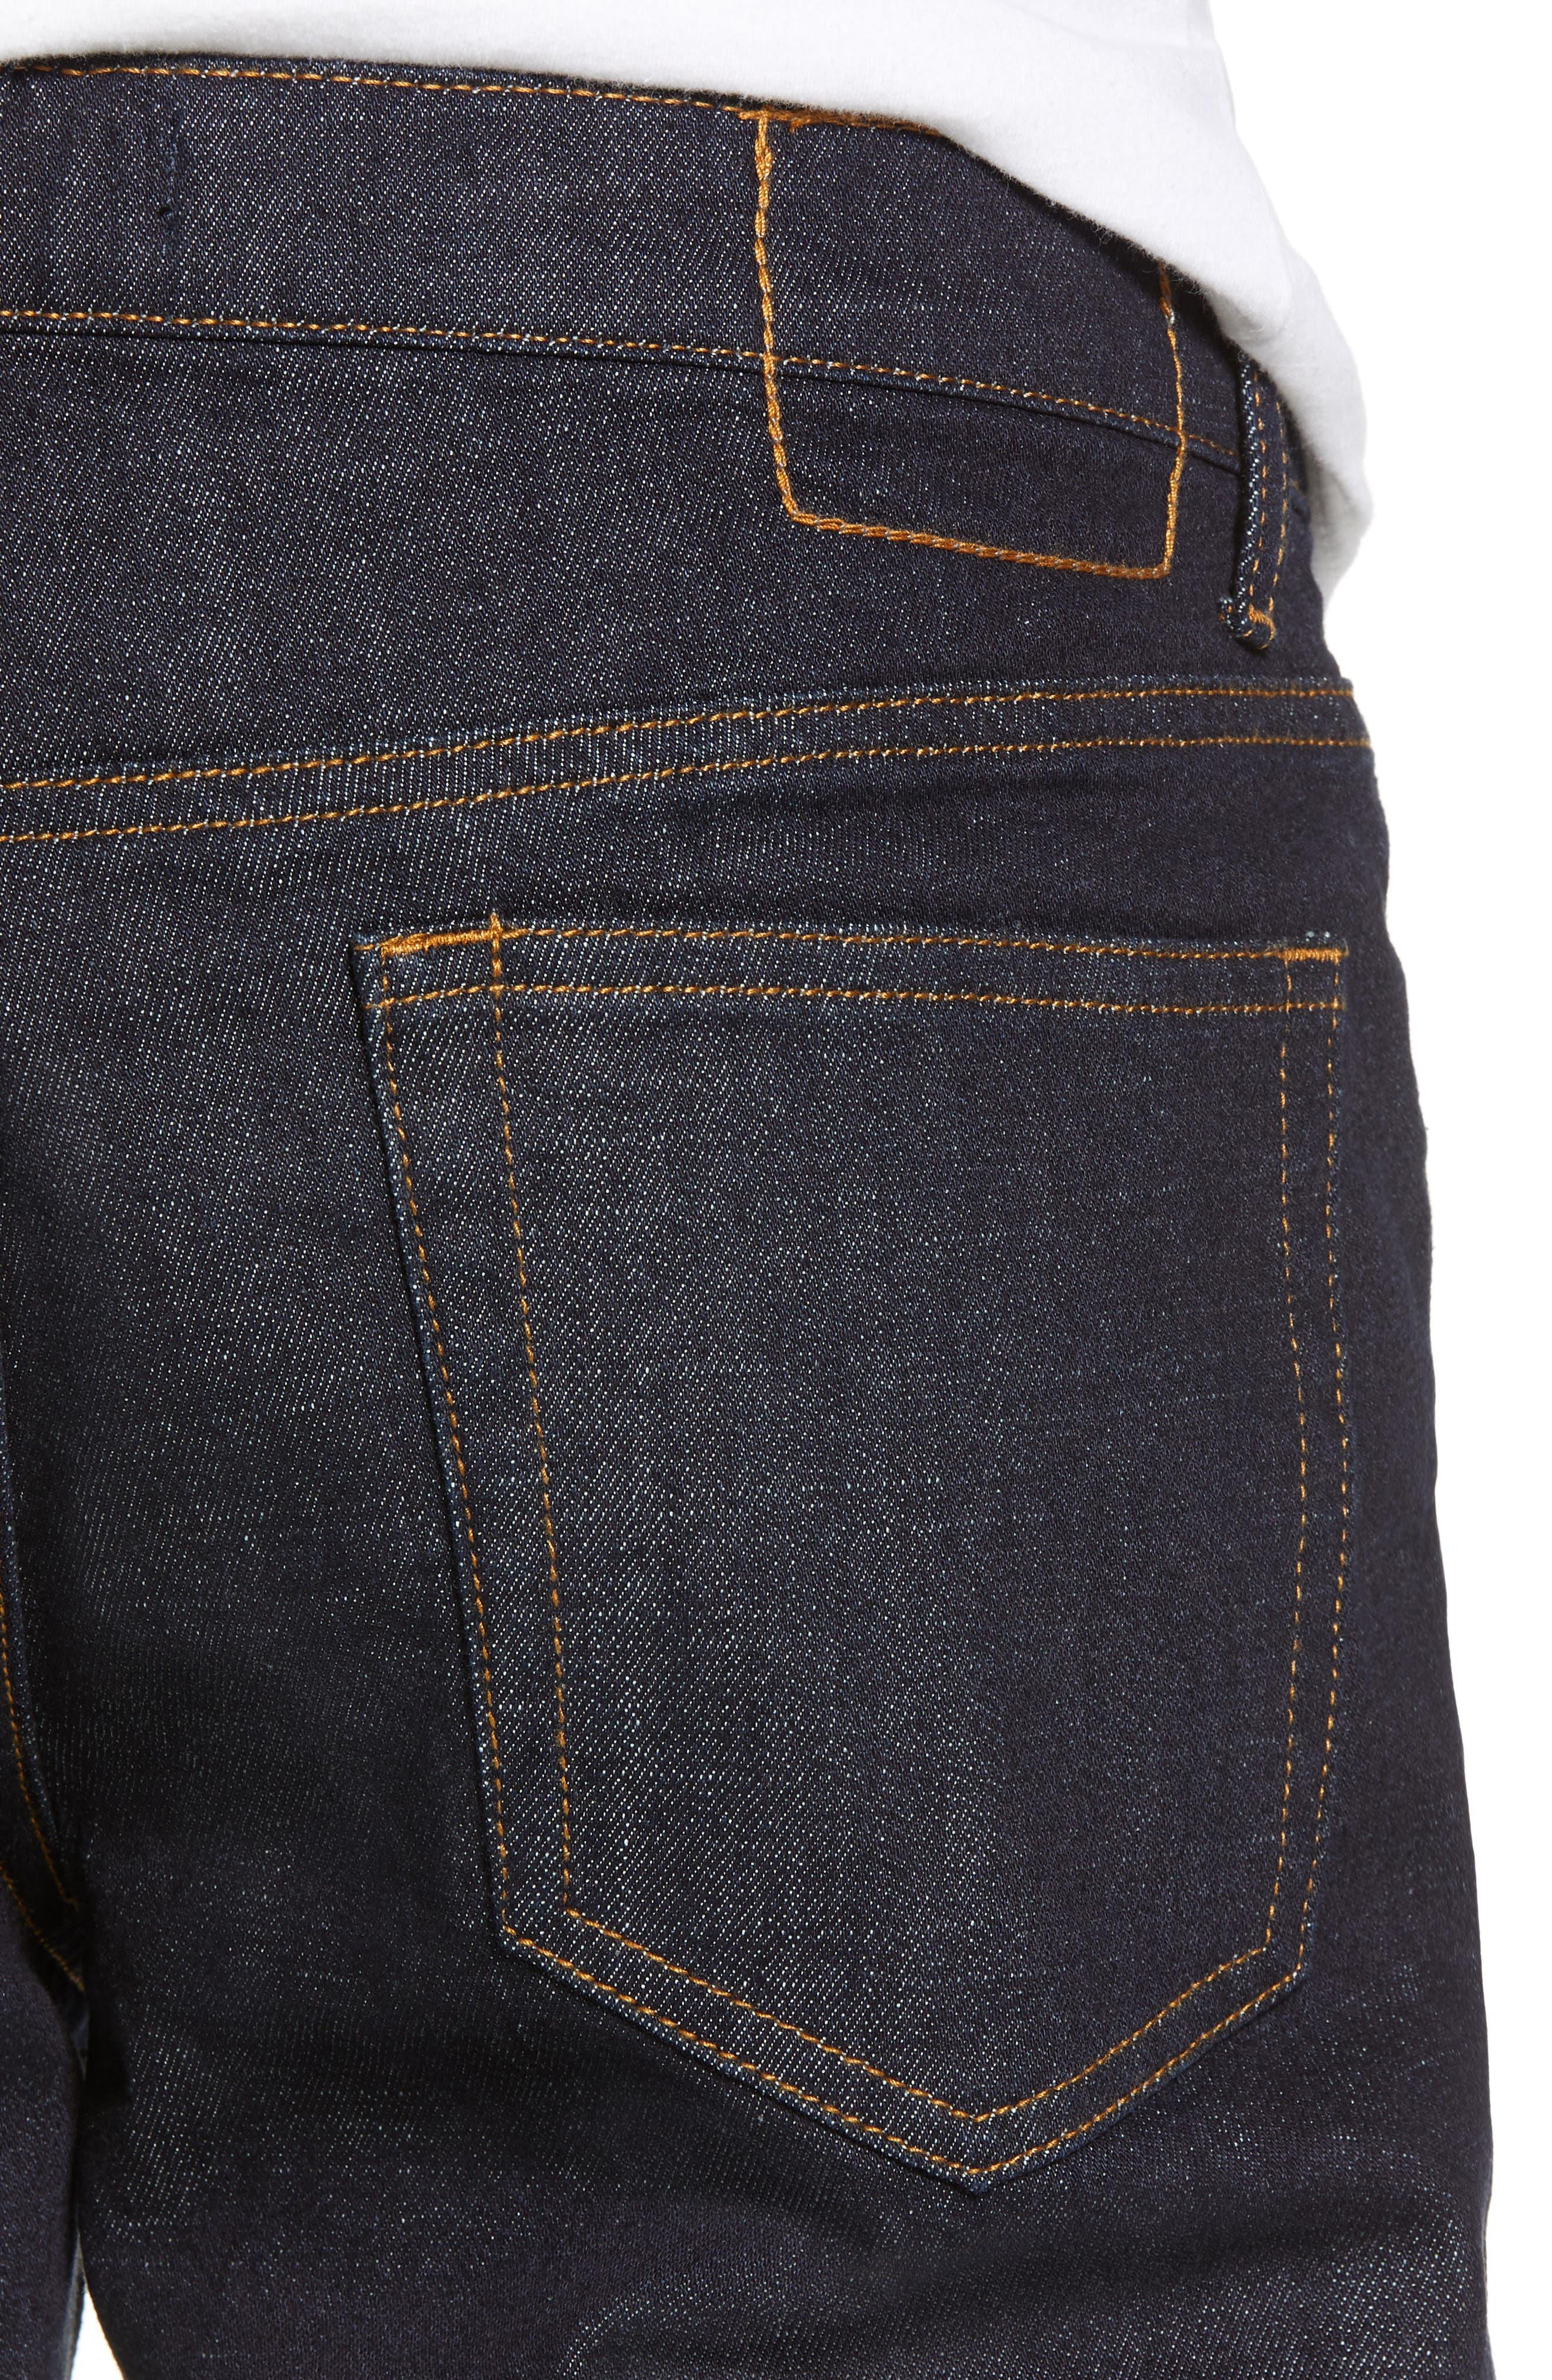 Stretch Slim Leg Jeans,                             Alternate thumbnail 4, color,                             BLUE PERRY WASH